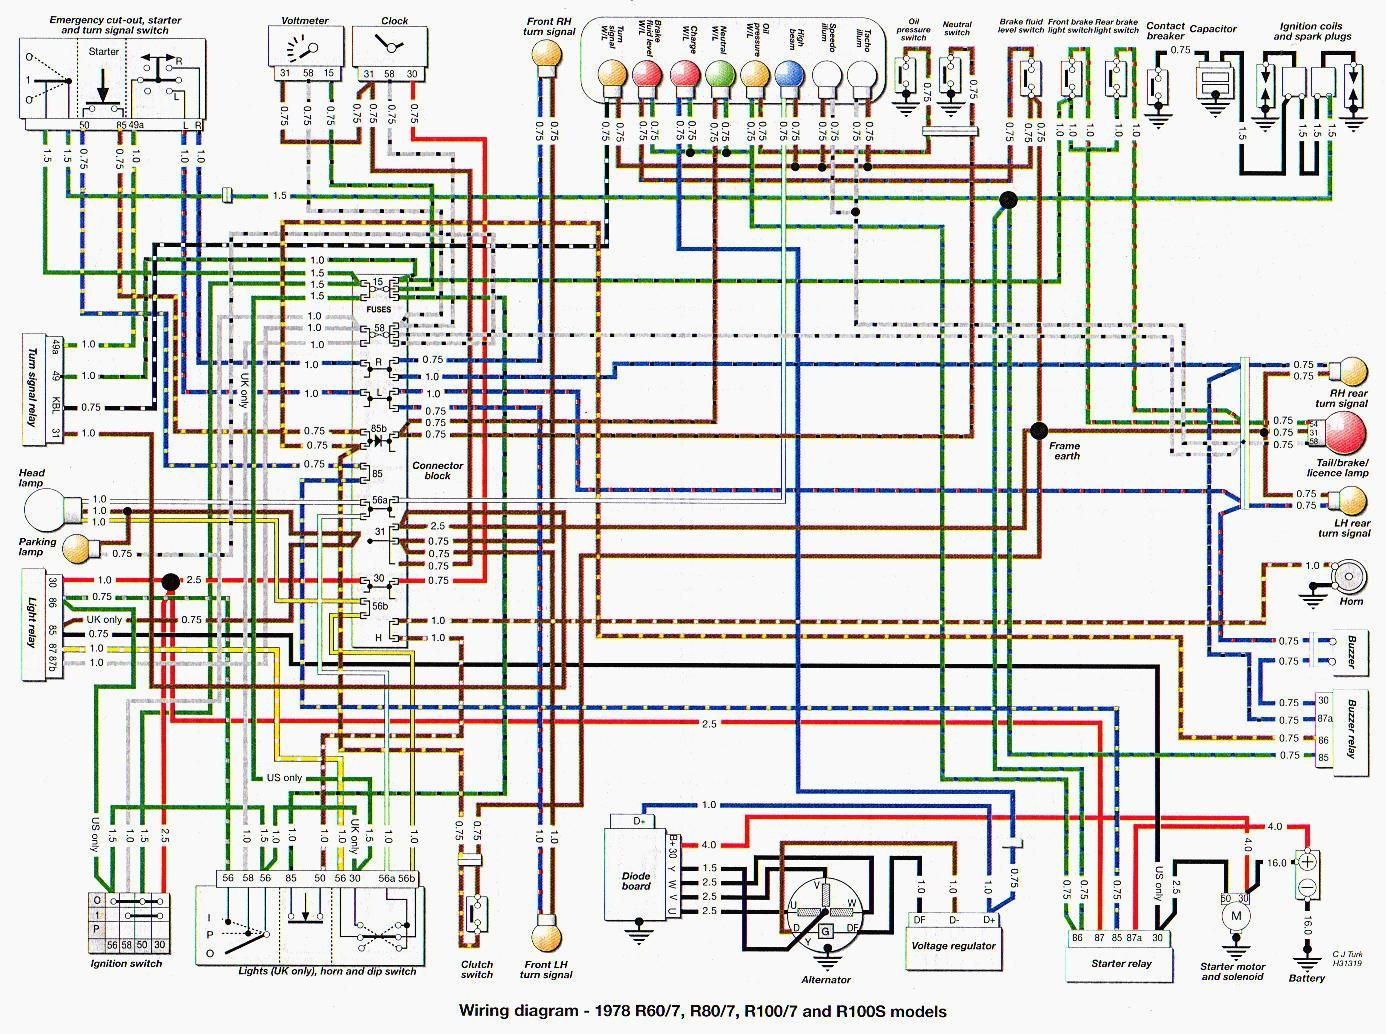 Vy 4777 R1200c Wiring Diagram in 2021 | Motorcycle wiring, Electrical  wiring diagram, Electrical wiring | Bmw R1200c Wiring Schematic |  | www.pinterest.ph